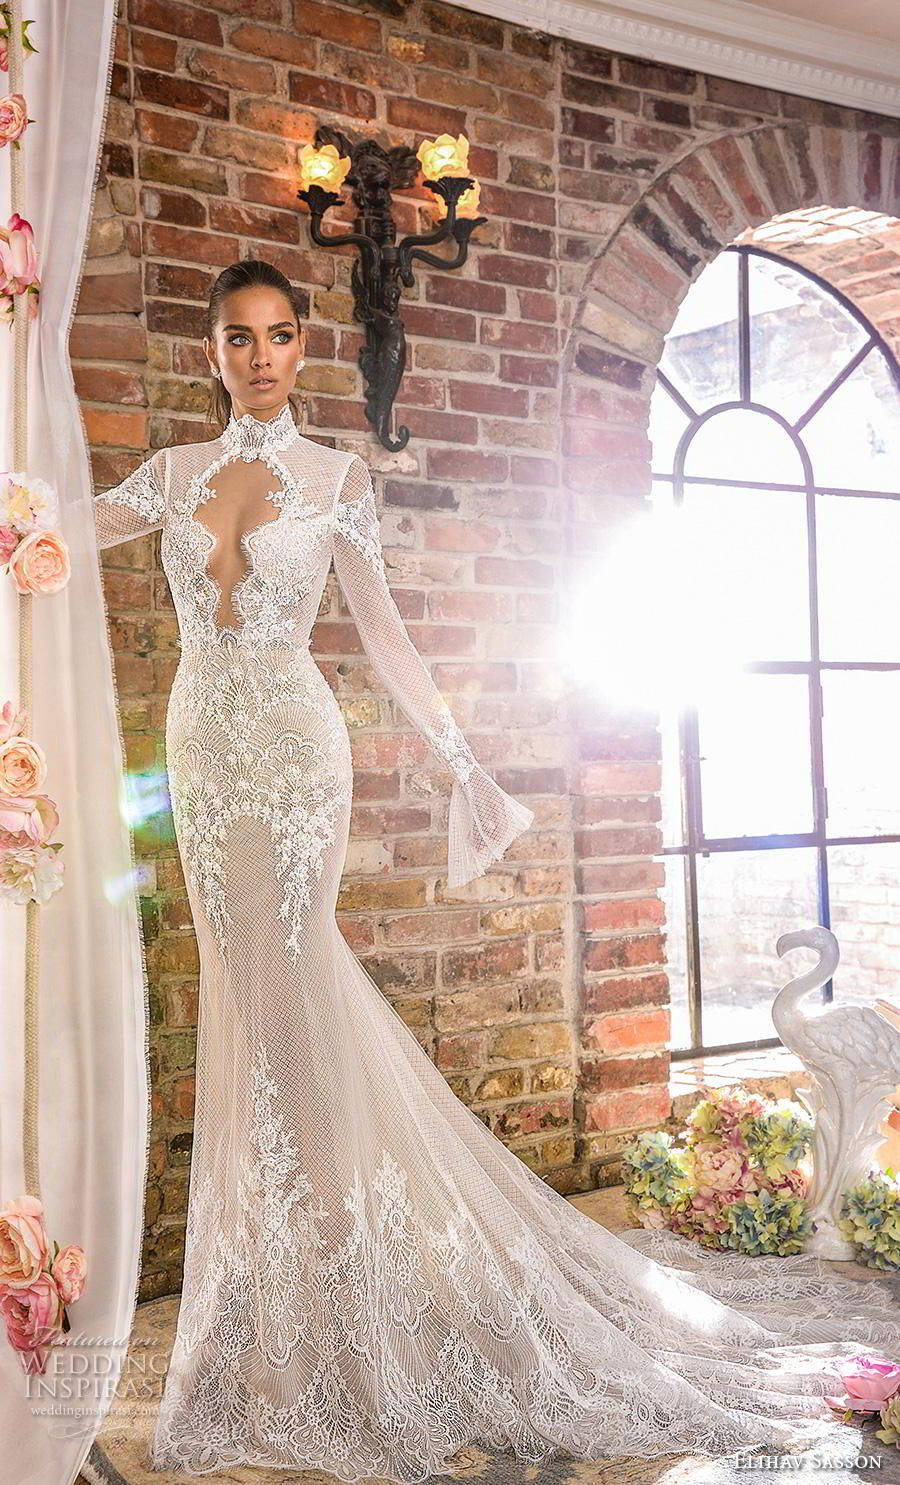 Elihav sasson wedding dresses wedding pinterest chapel